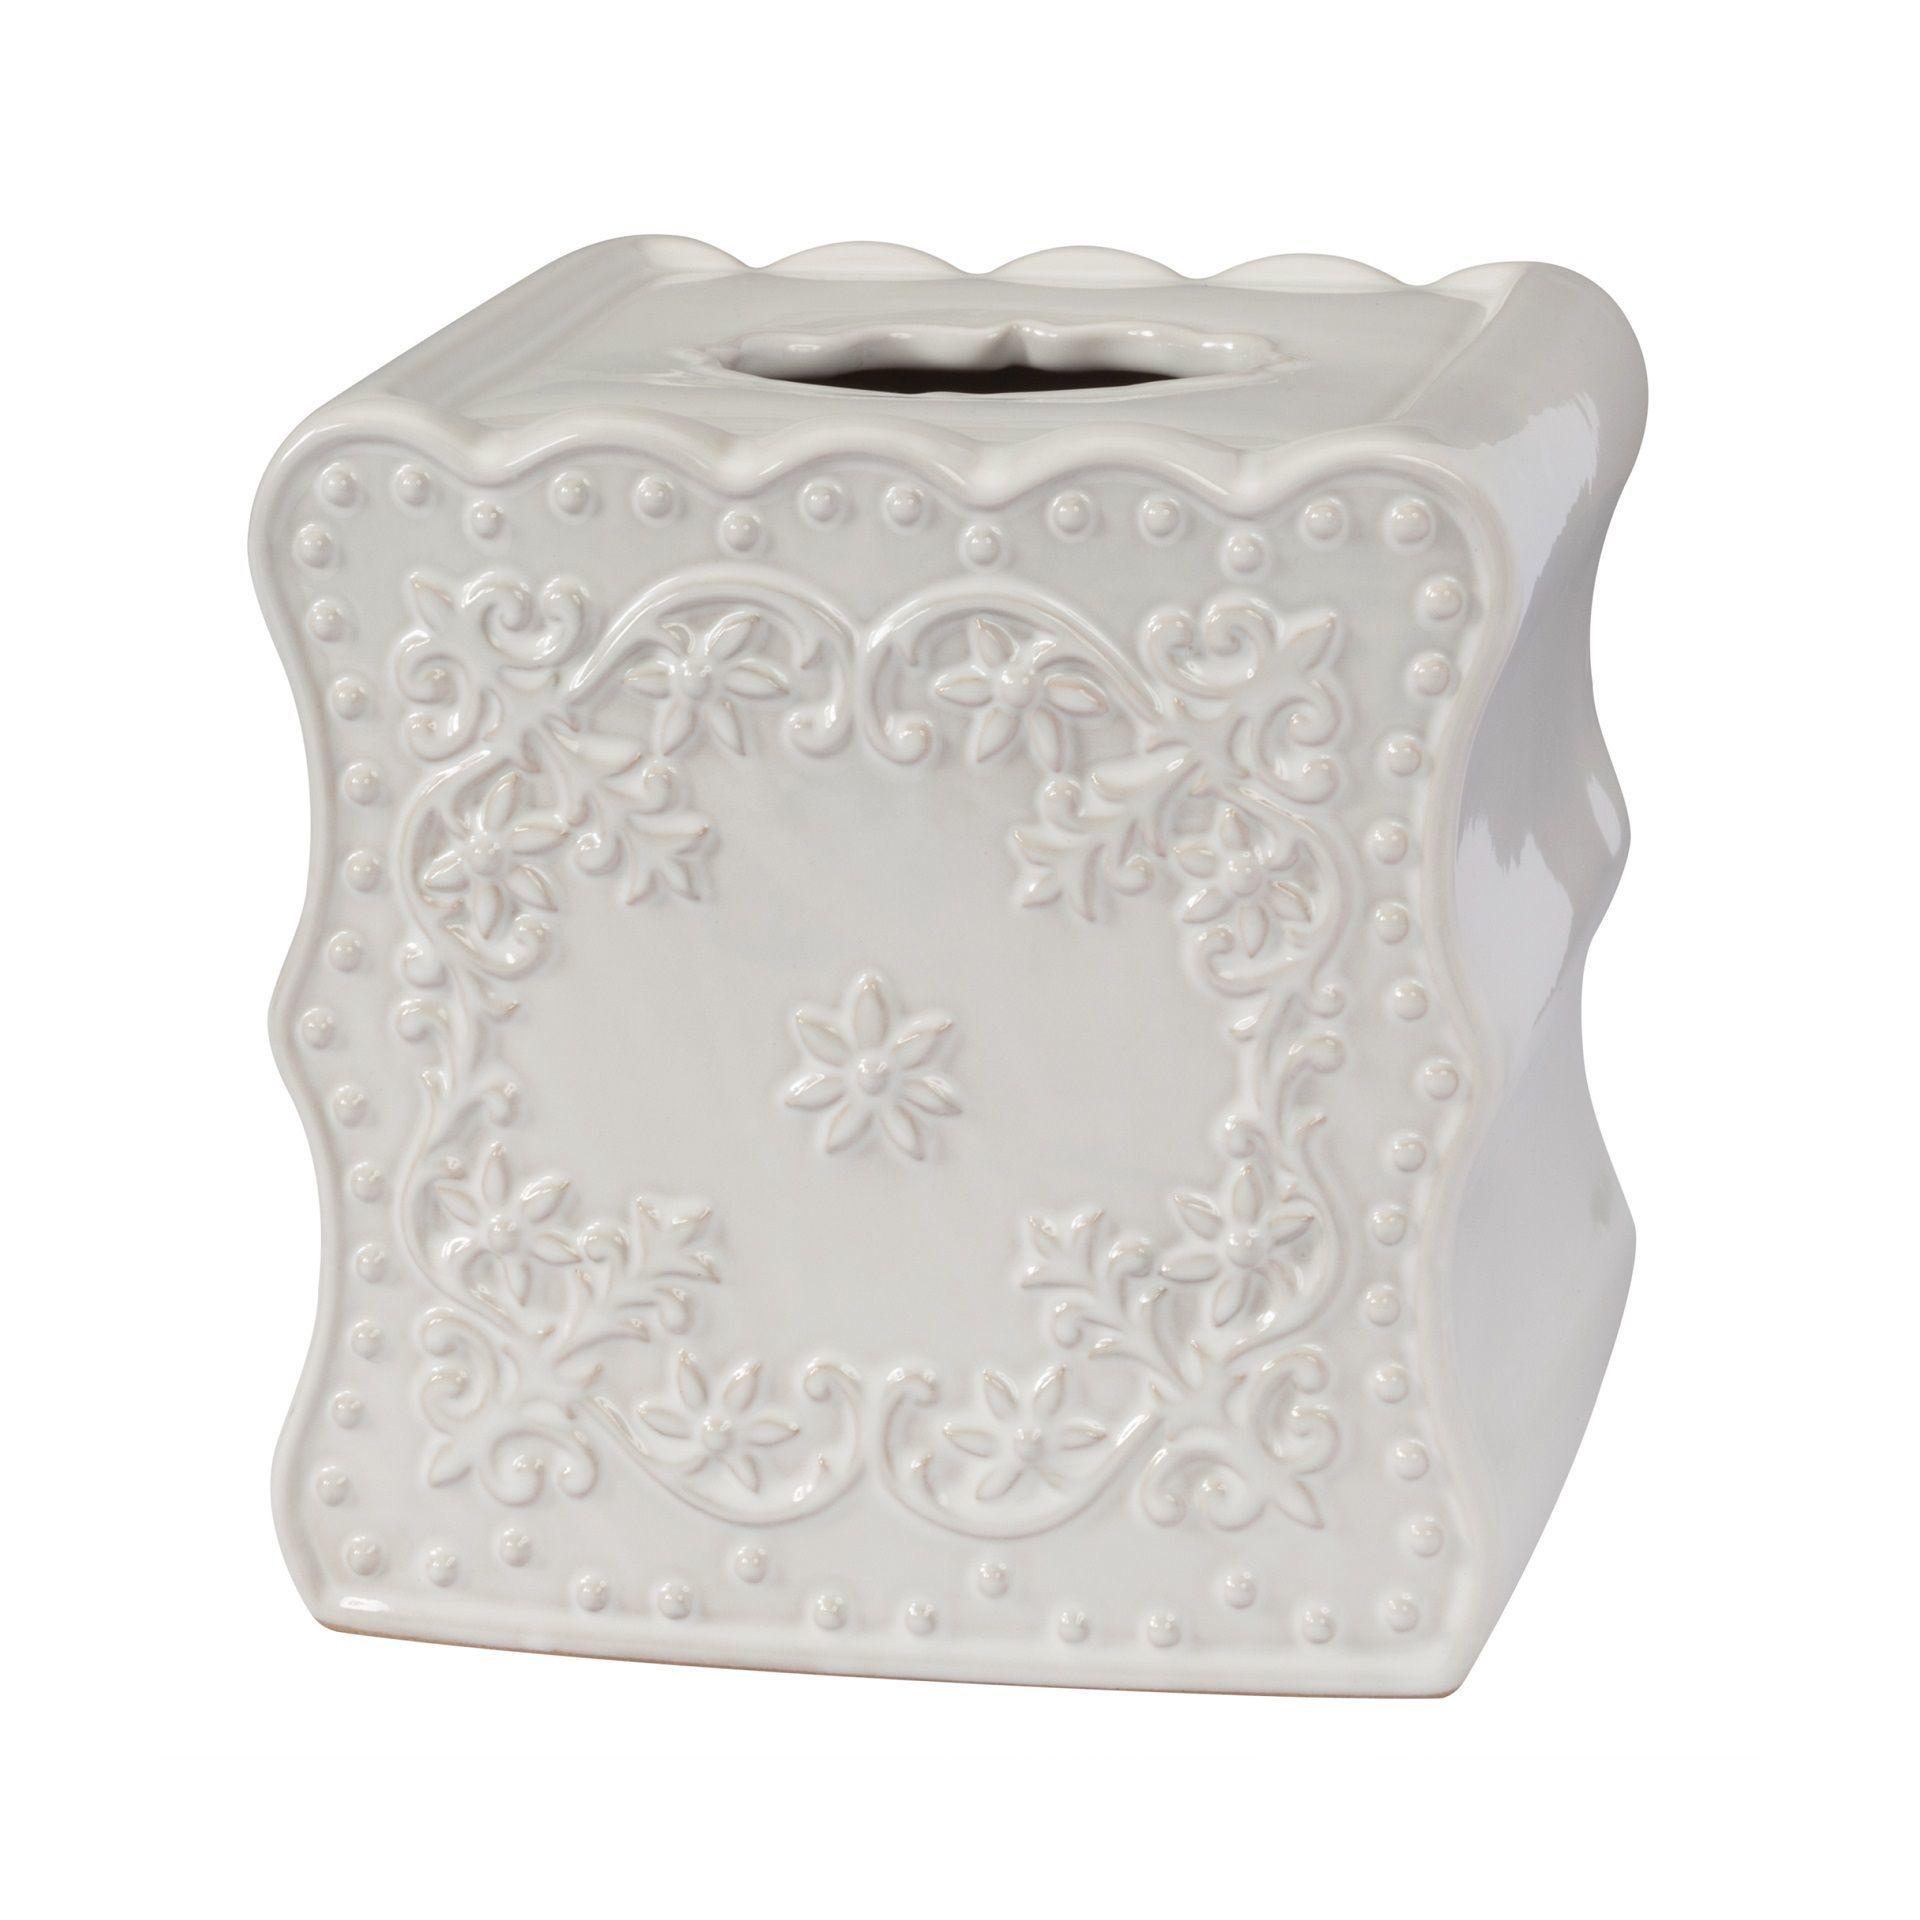 Салфетницы Салфетница Creative Bath Ruffles salfetnitsa-ruffles-ot-creative-bath-ssha-kitay.jpg